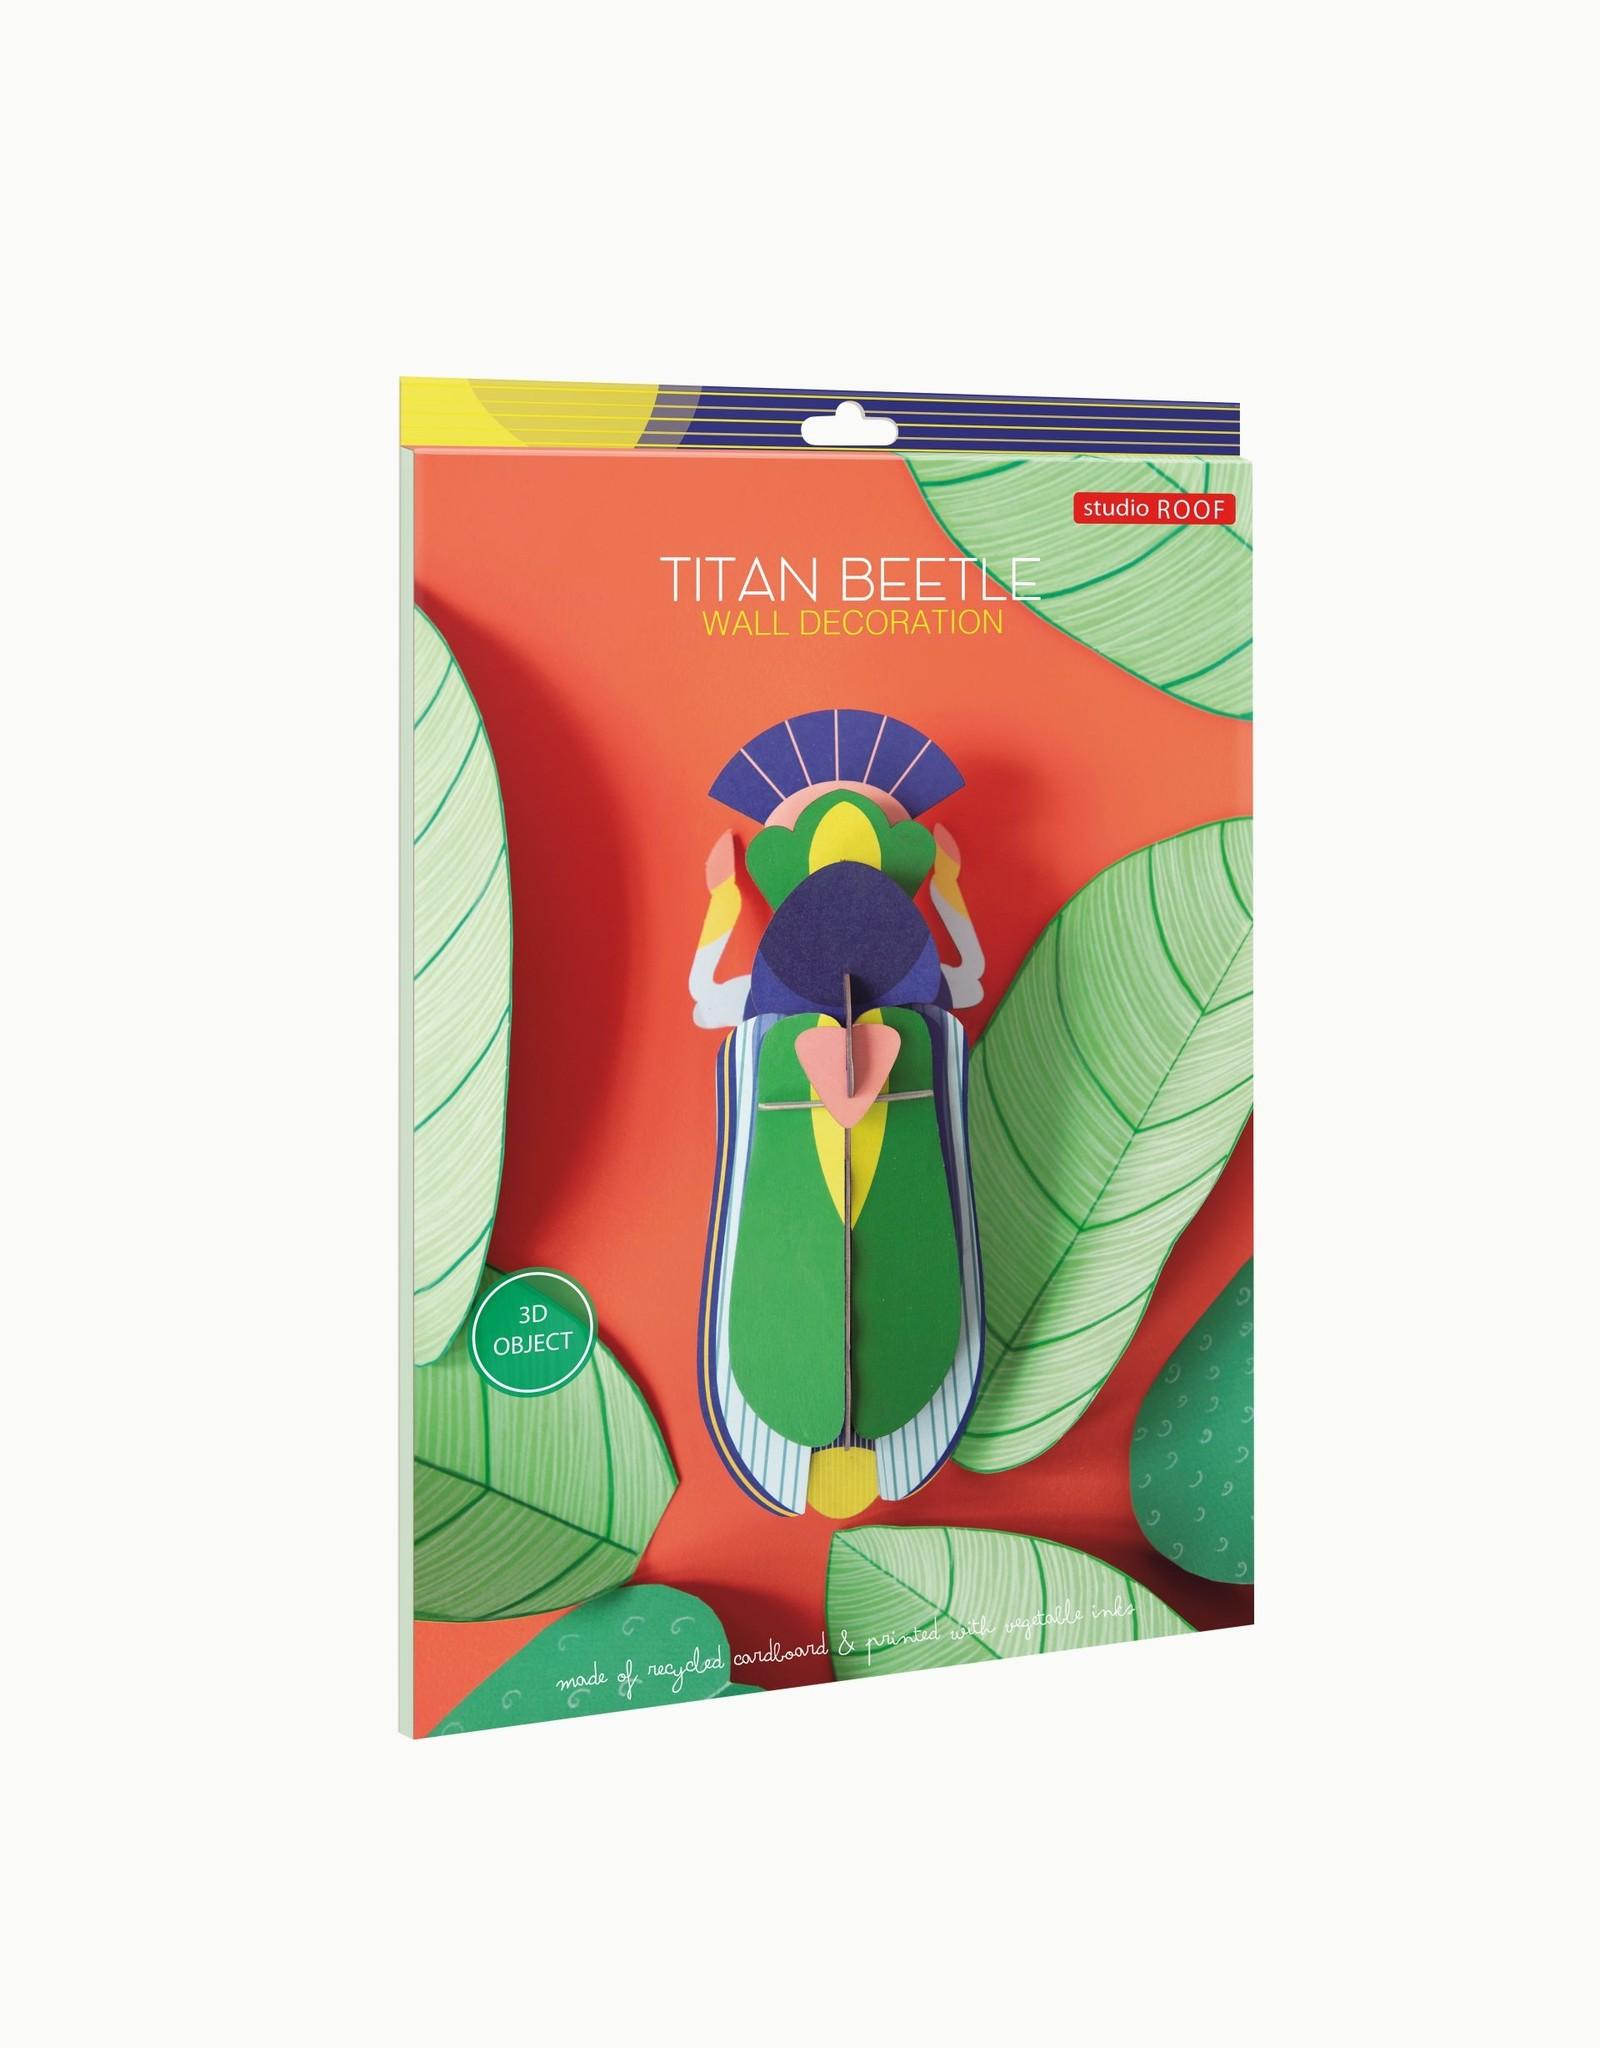 Studioroof Titan Beetle